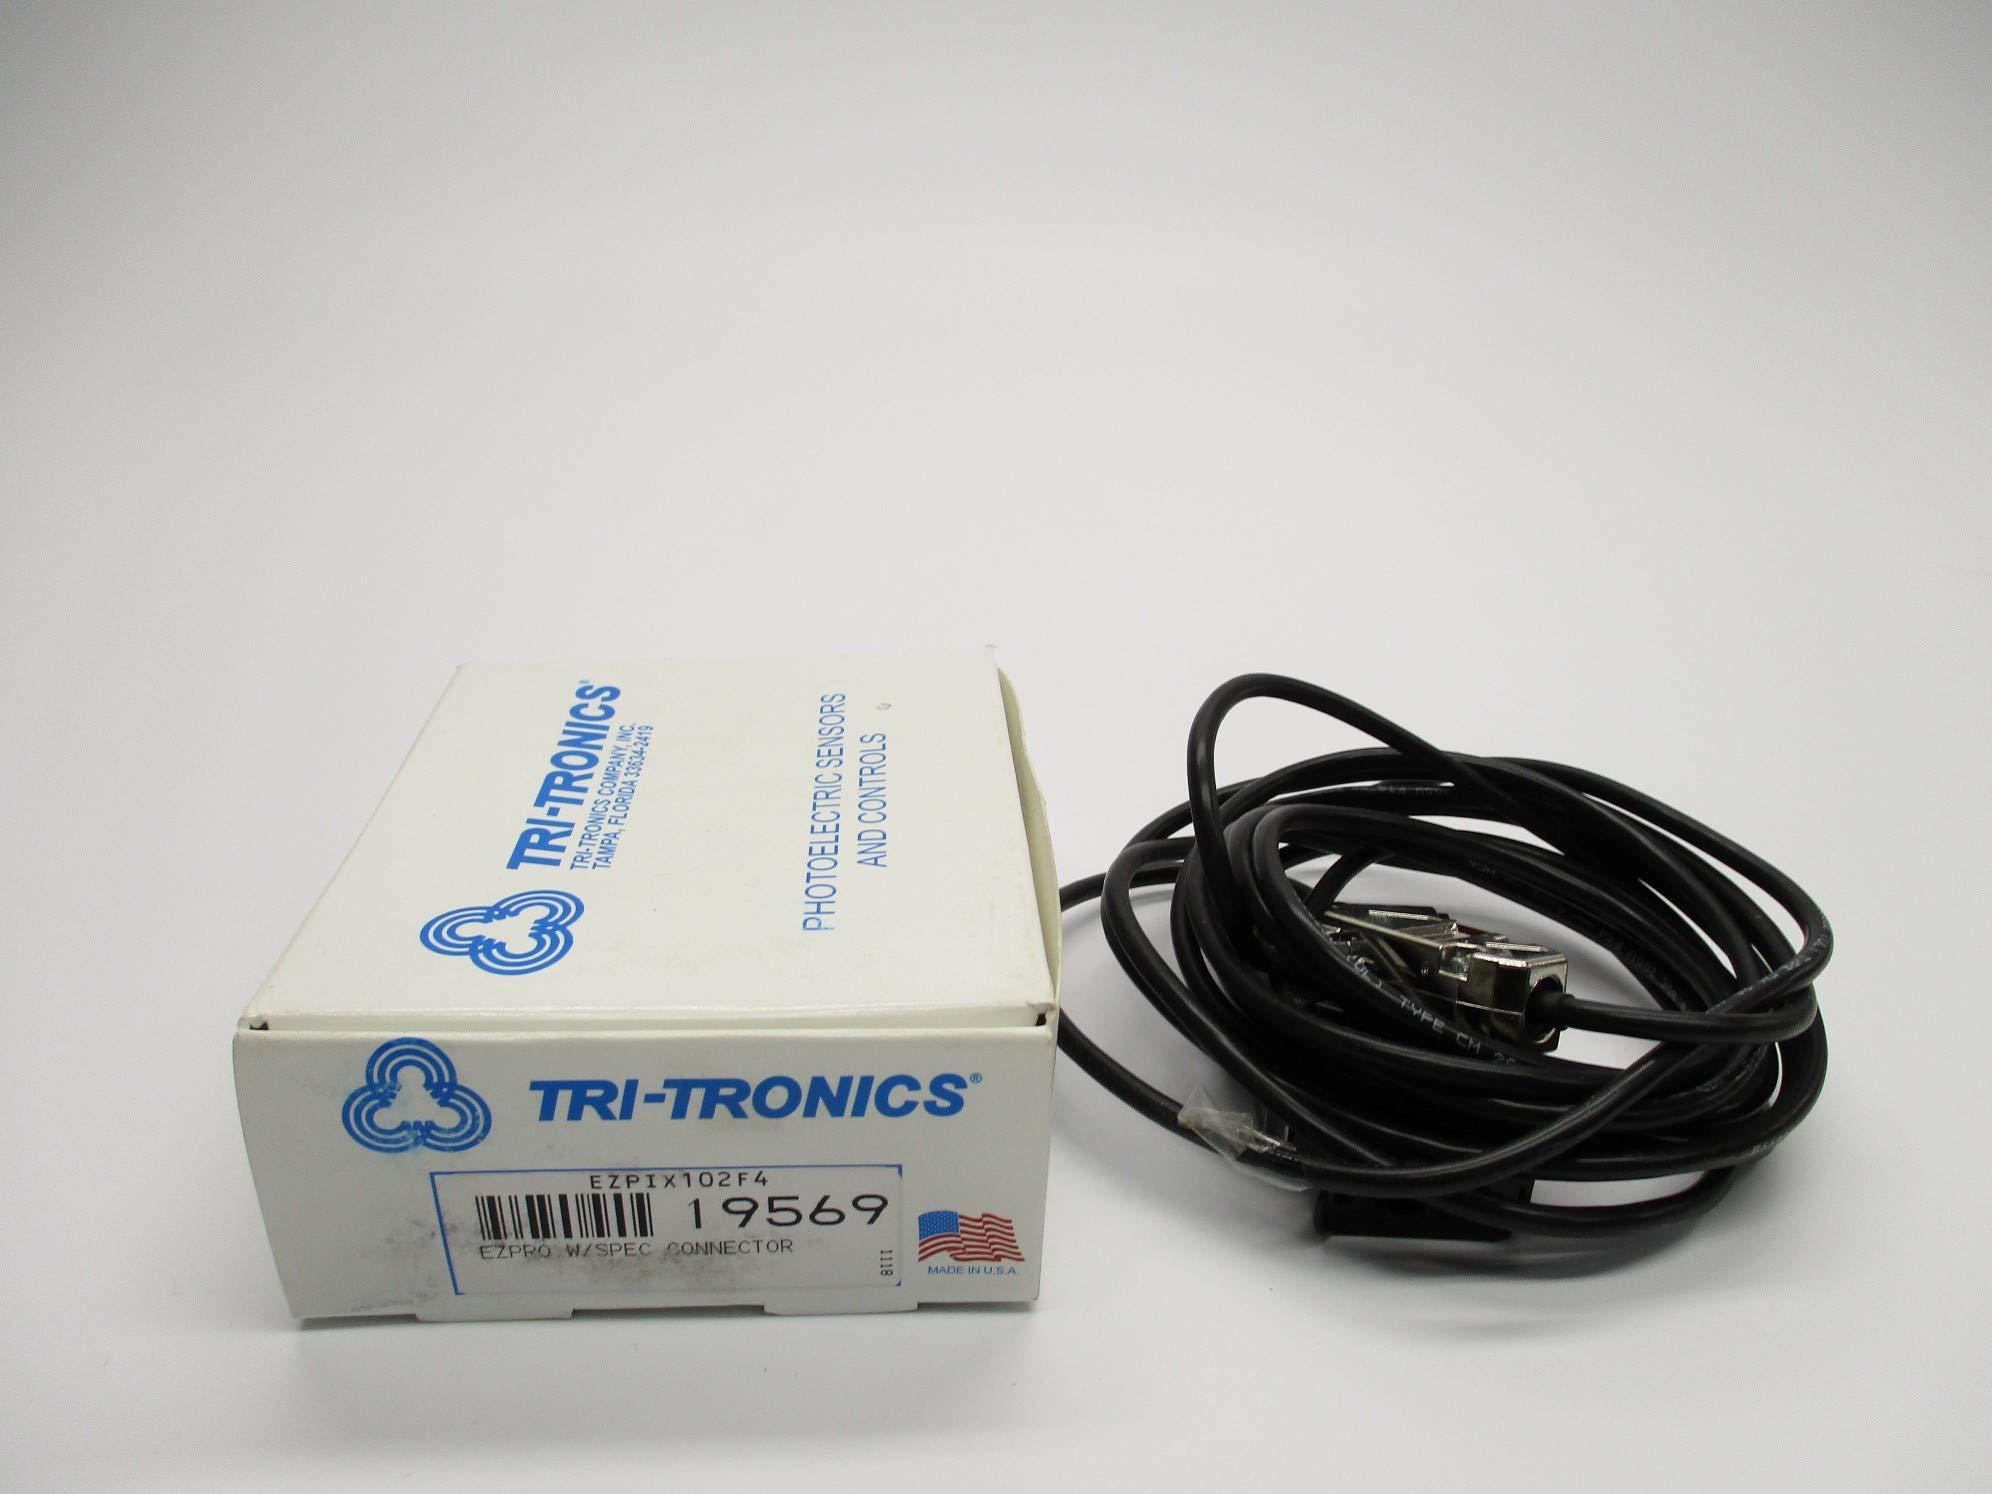 TRI-TRONICS EZPIX102F4 NSMP